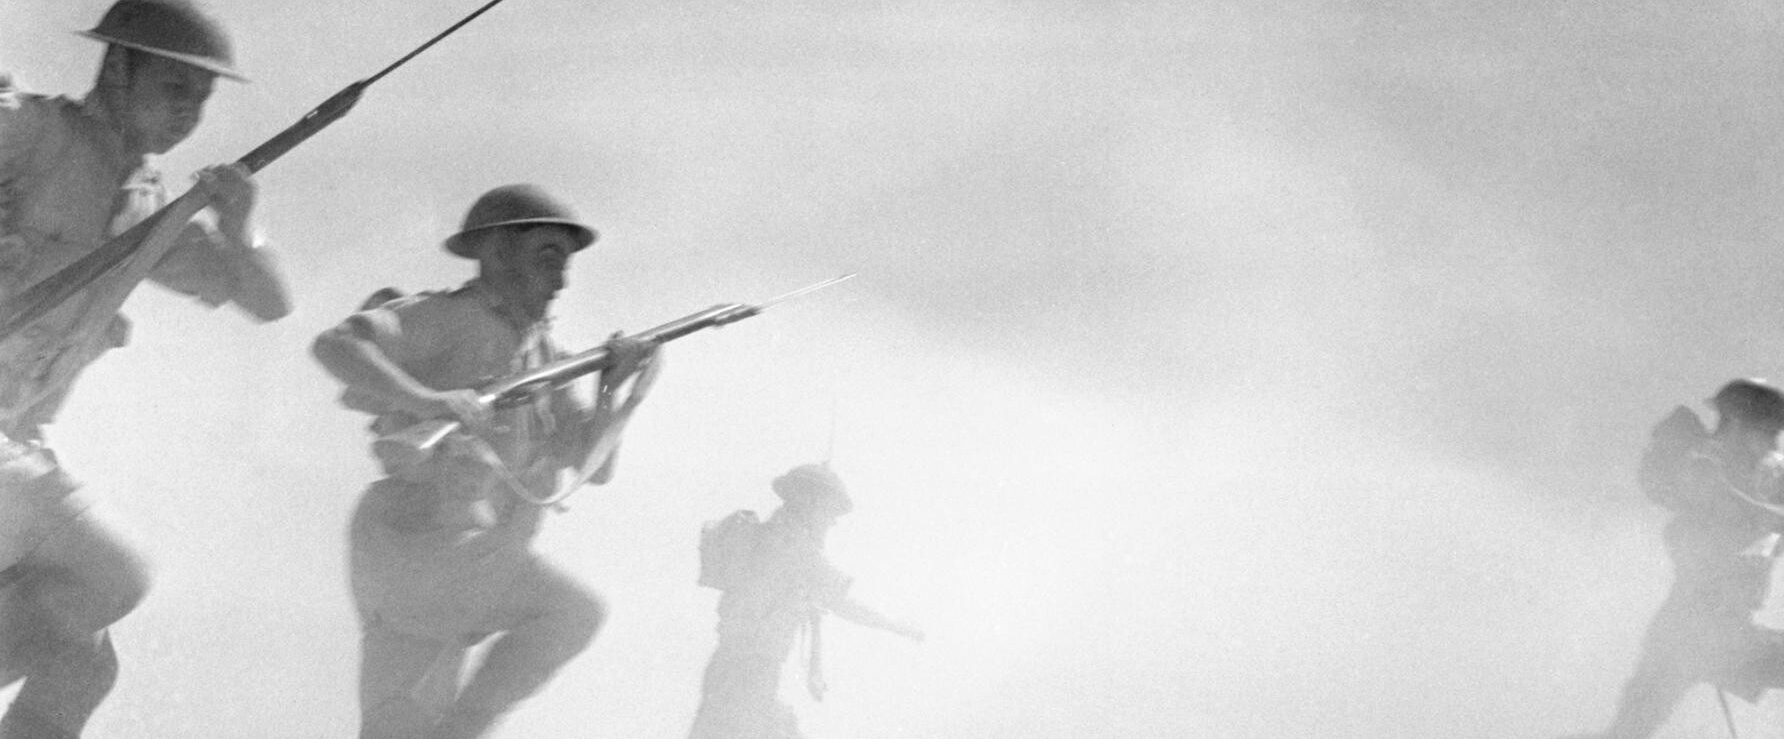 El Alamein 1942, Imperial War Museum